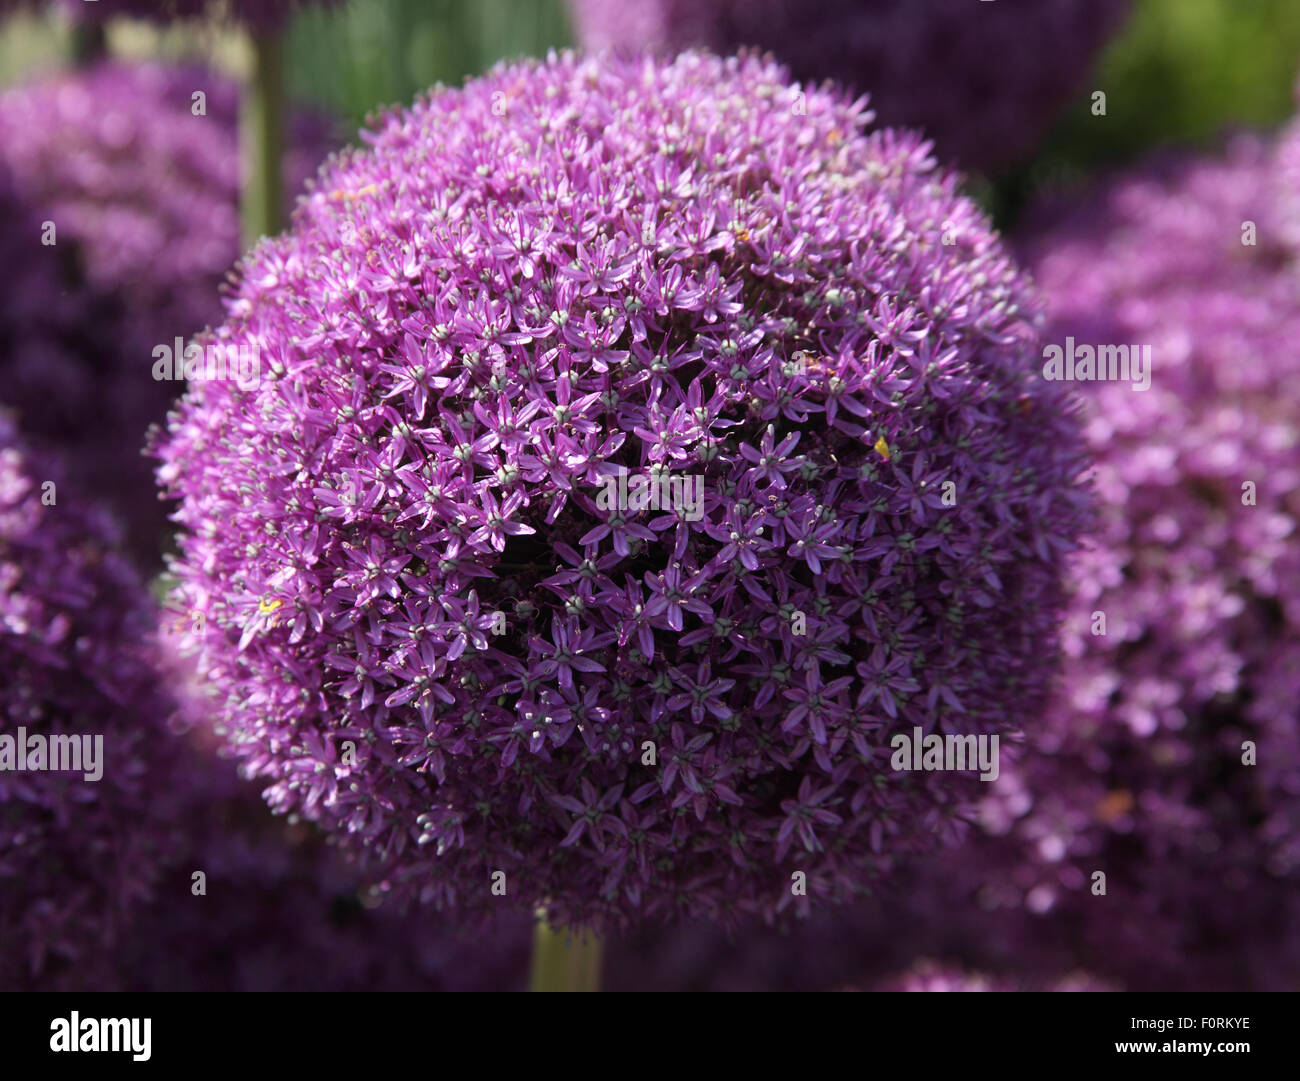 Allium 'Ambassador' close up of flower - Stock Image